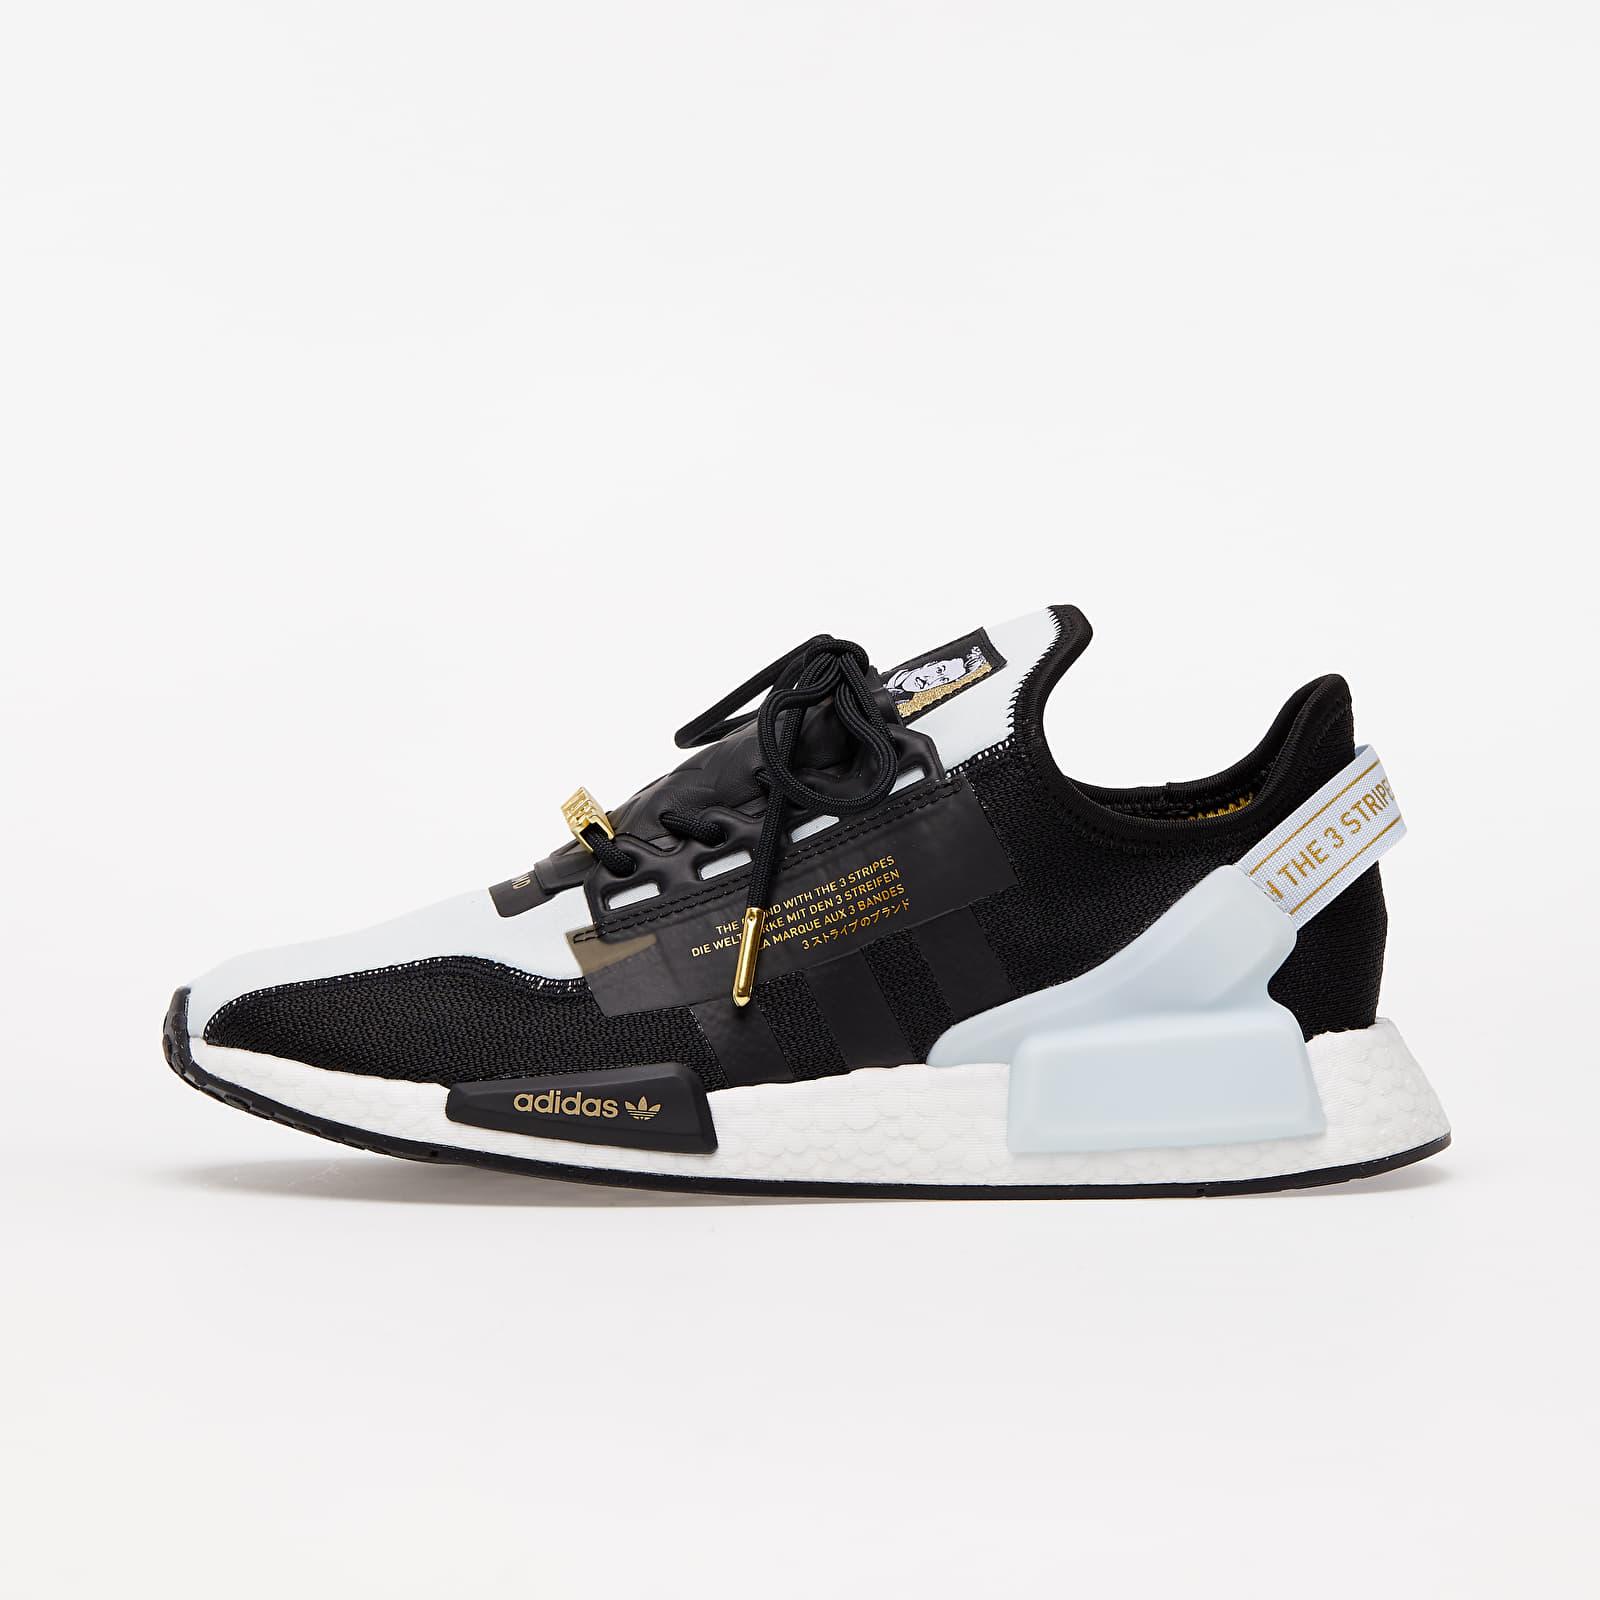 Men's shoes adidas x Star Wars NMD R1.V2 Sky Tint/ Core Black/ Gold Metalic